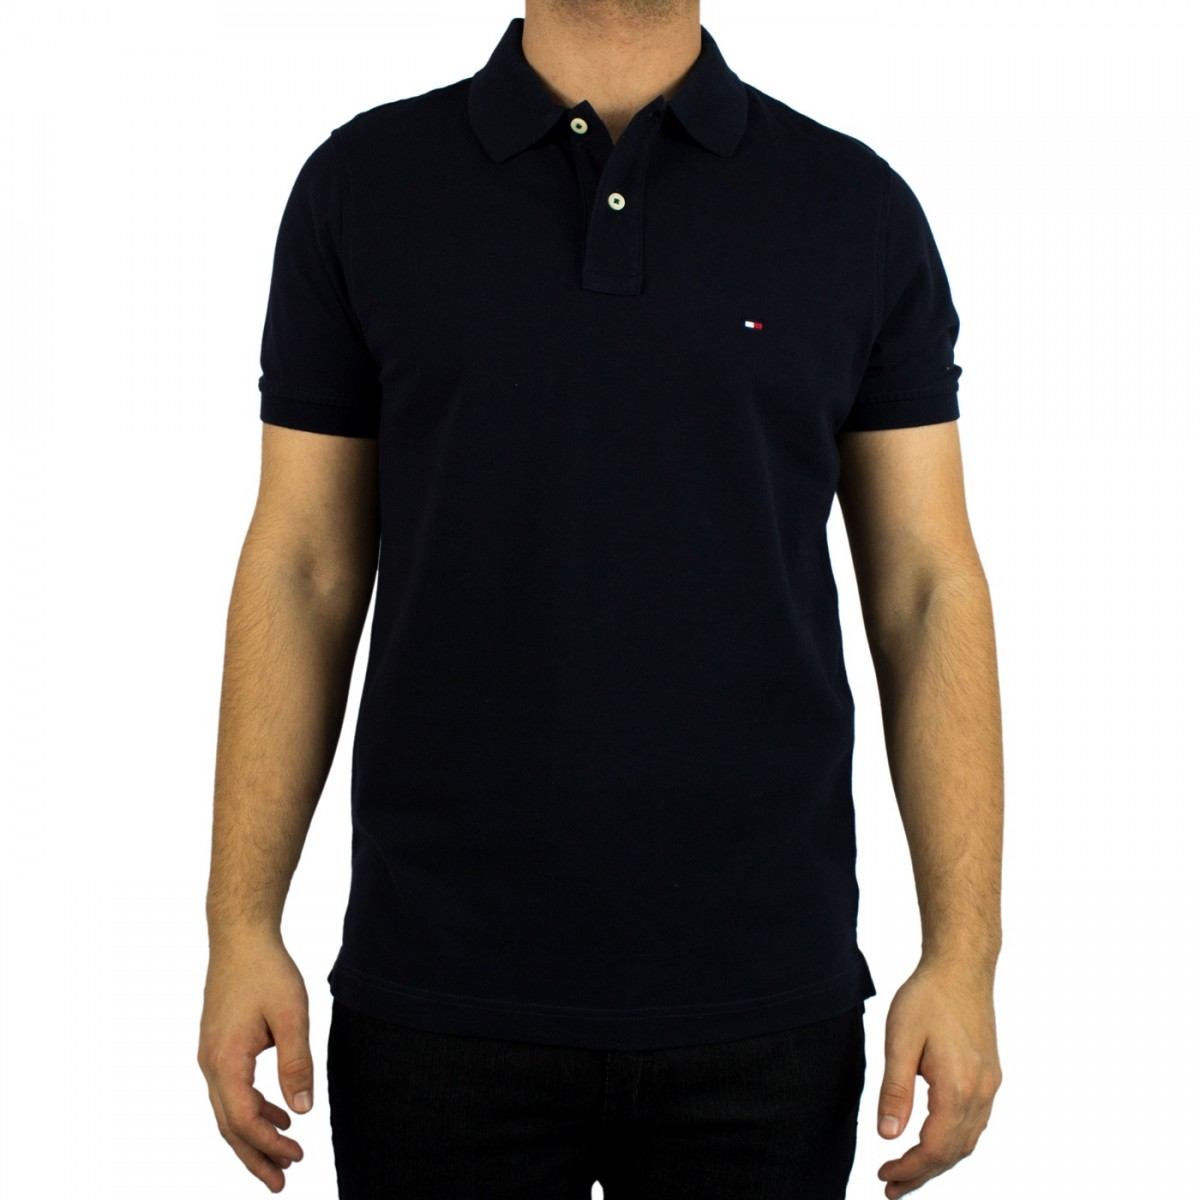 aac311f85 Bizz Store - Camisa Polo Masculina Tommy Hilfiger Marinho